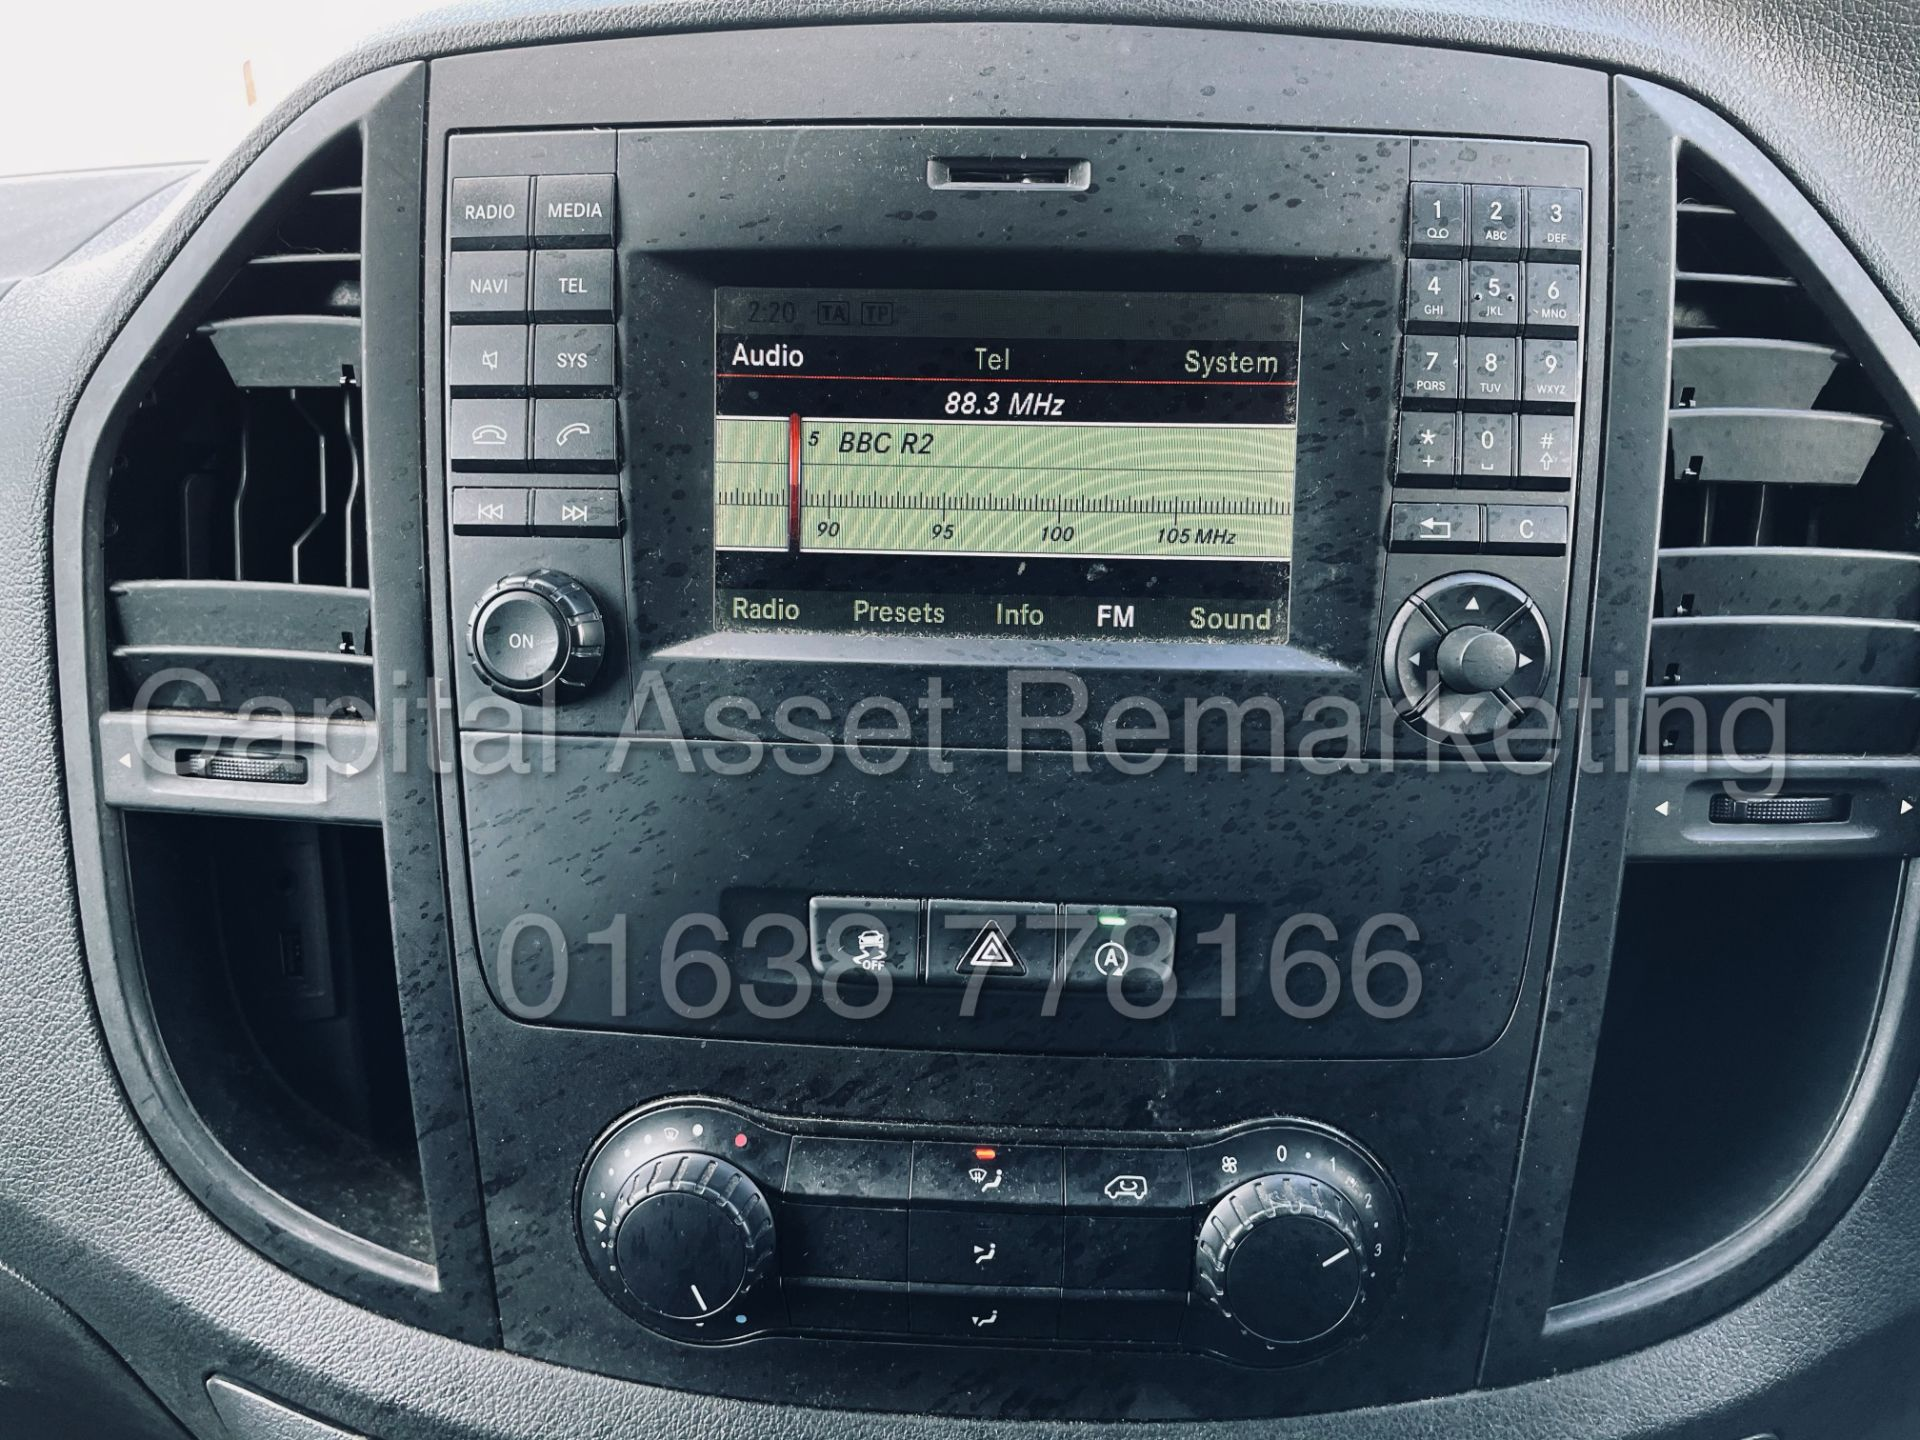 (On Sale) MERCEDES-BENZ VITO 114 *LWB -PANEL VAN* (2017 - EURO 6) '134 BHP - 6 SPEED' *65,000 MILES* - Image 29 of 34